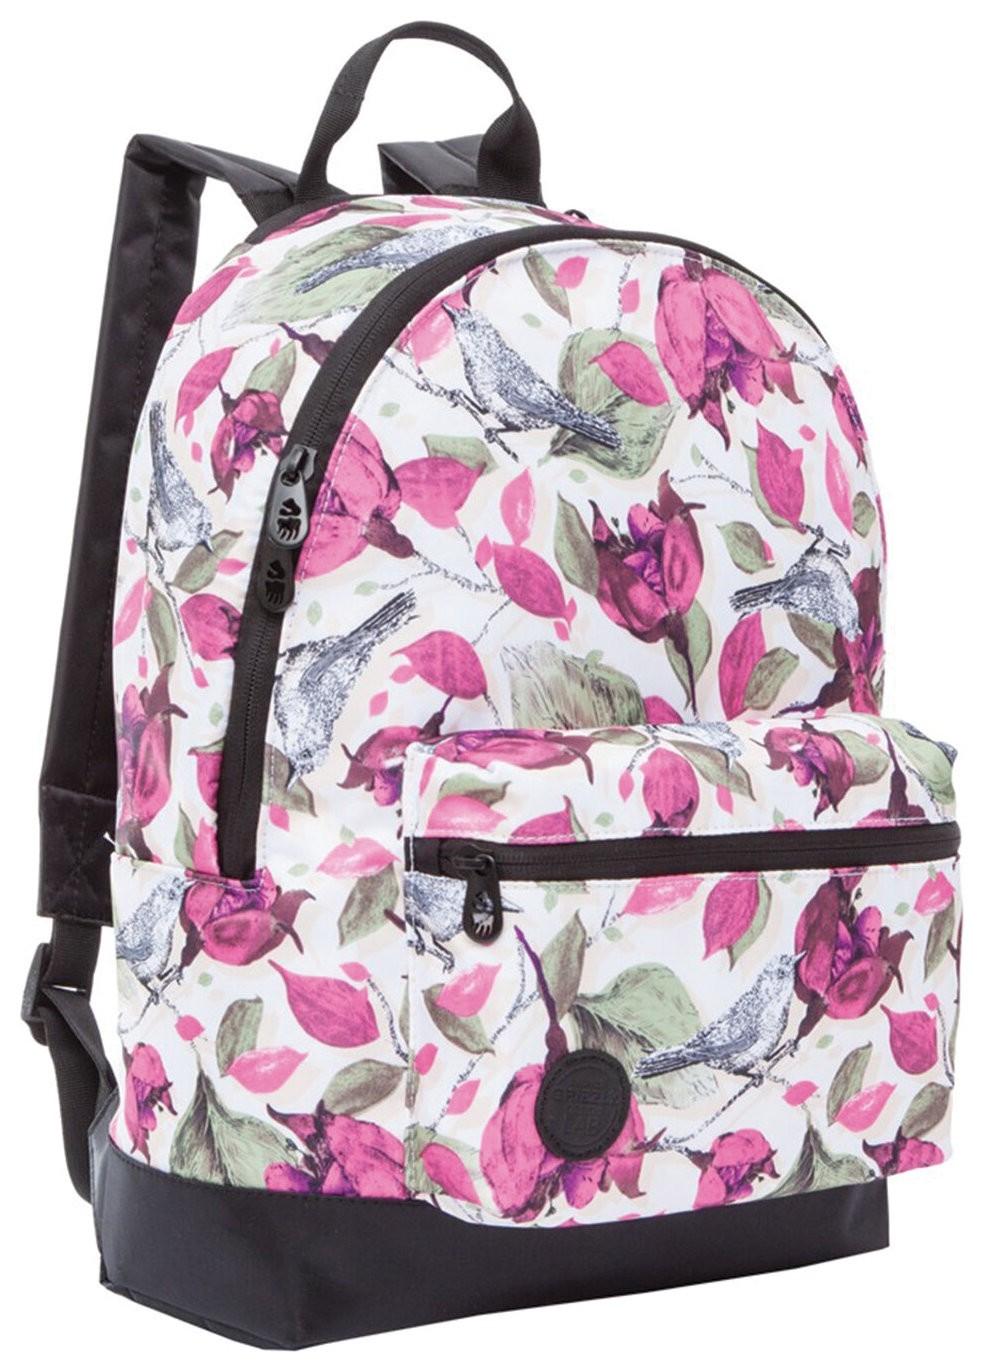 Рюкзак молодежный Весеннее утро 41x30x12 см  Grizzly